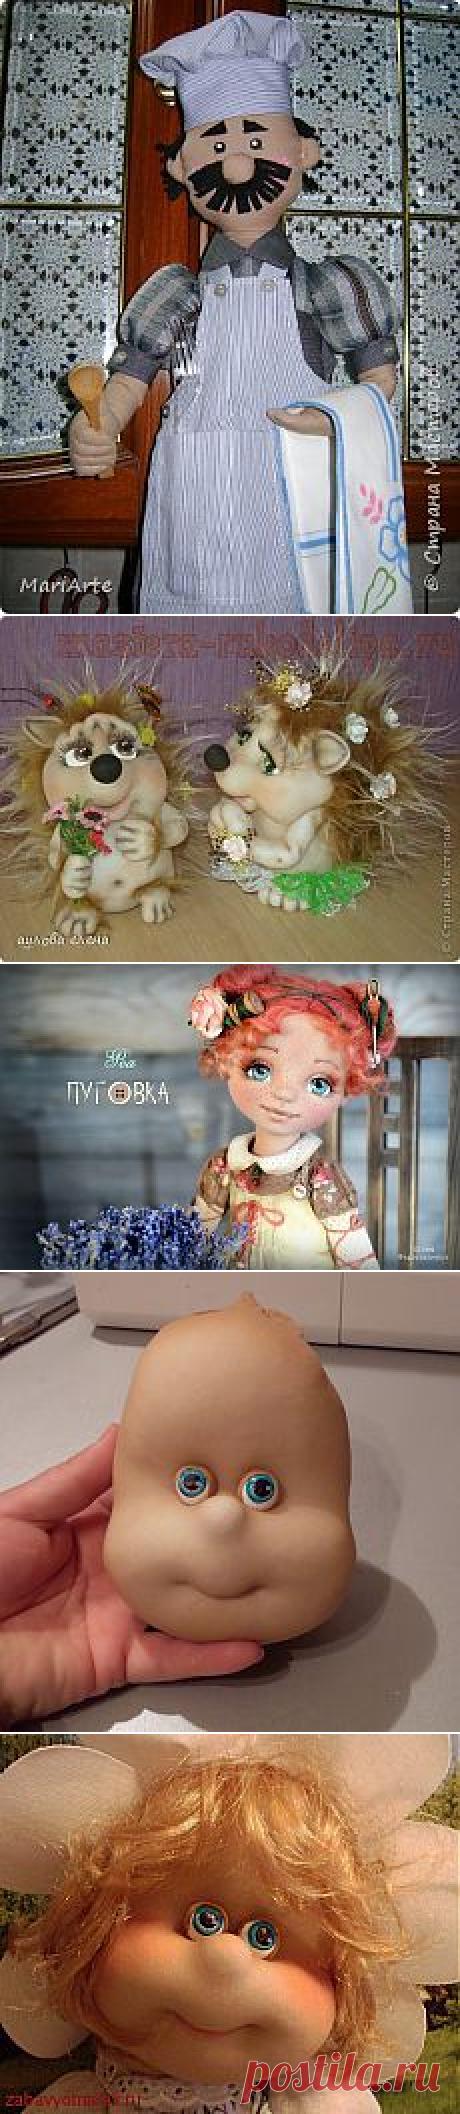 кукла   Ирина Наймановская   Фотографии и советы на Постиле